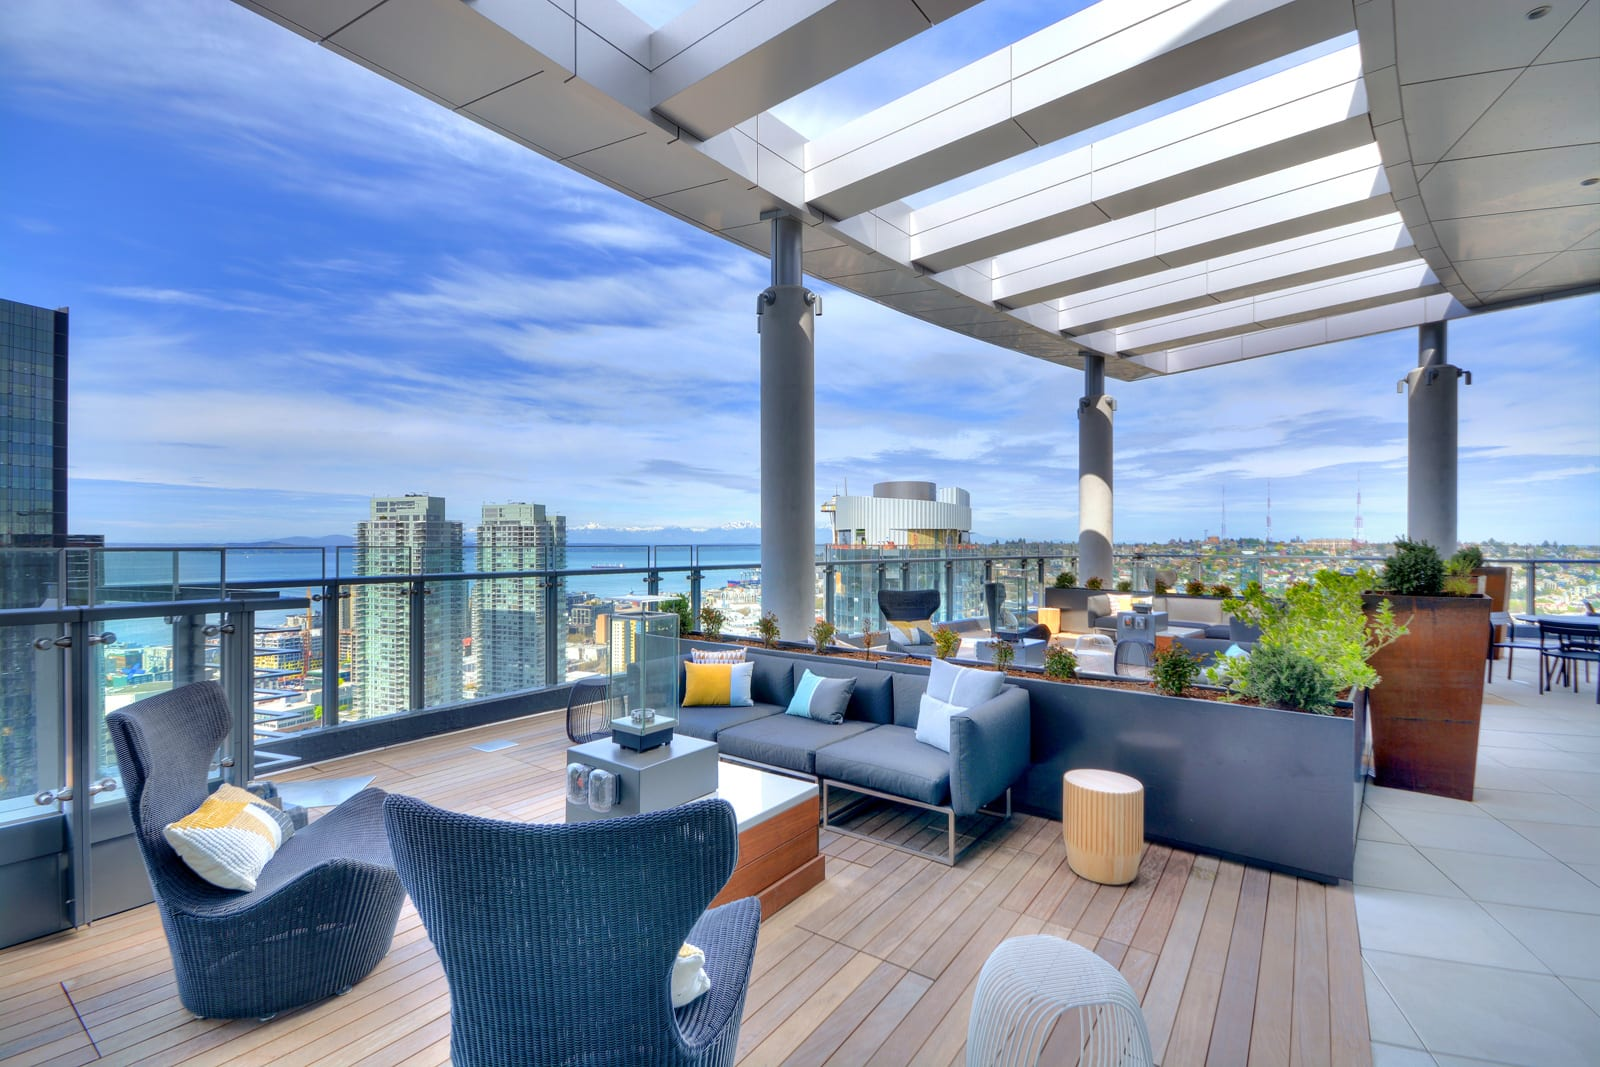 Stratus Luxury Apartments Near Amazon Headquarters